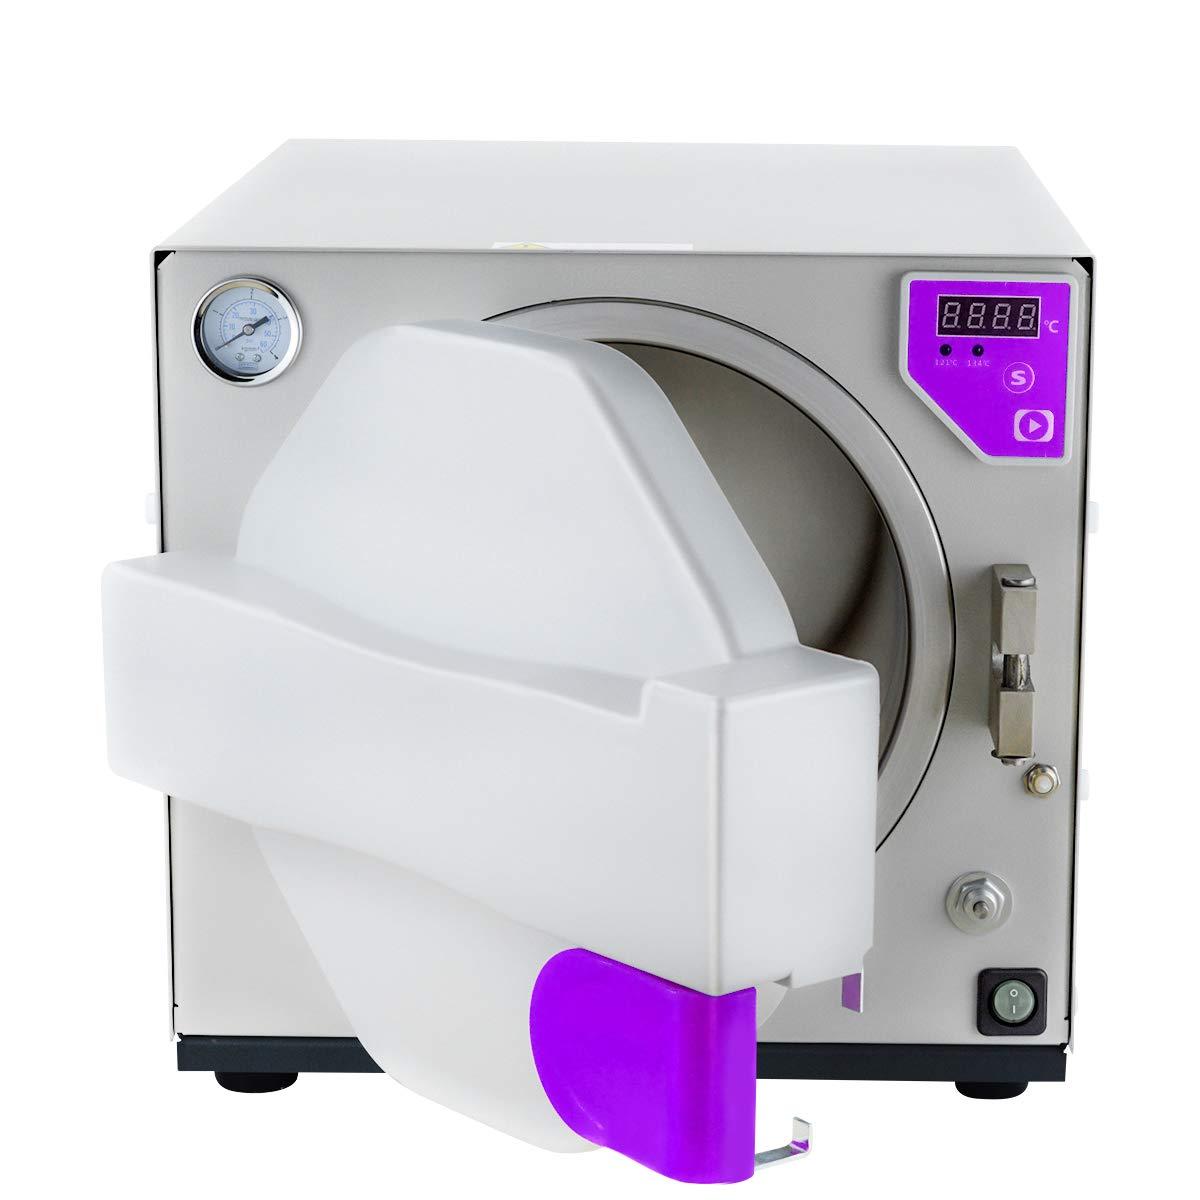 BONEW 18L Autoclave Steam Dental Lab Equipment Tool Mini330 by BONEW (Image #7)